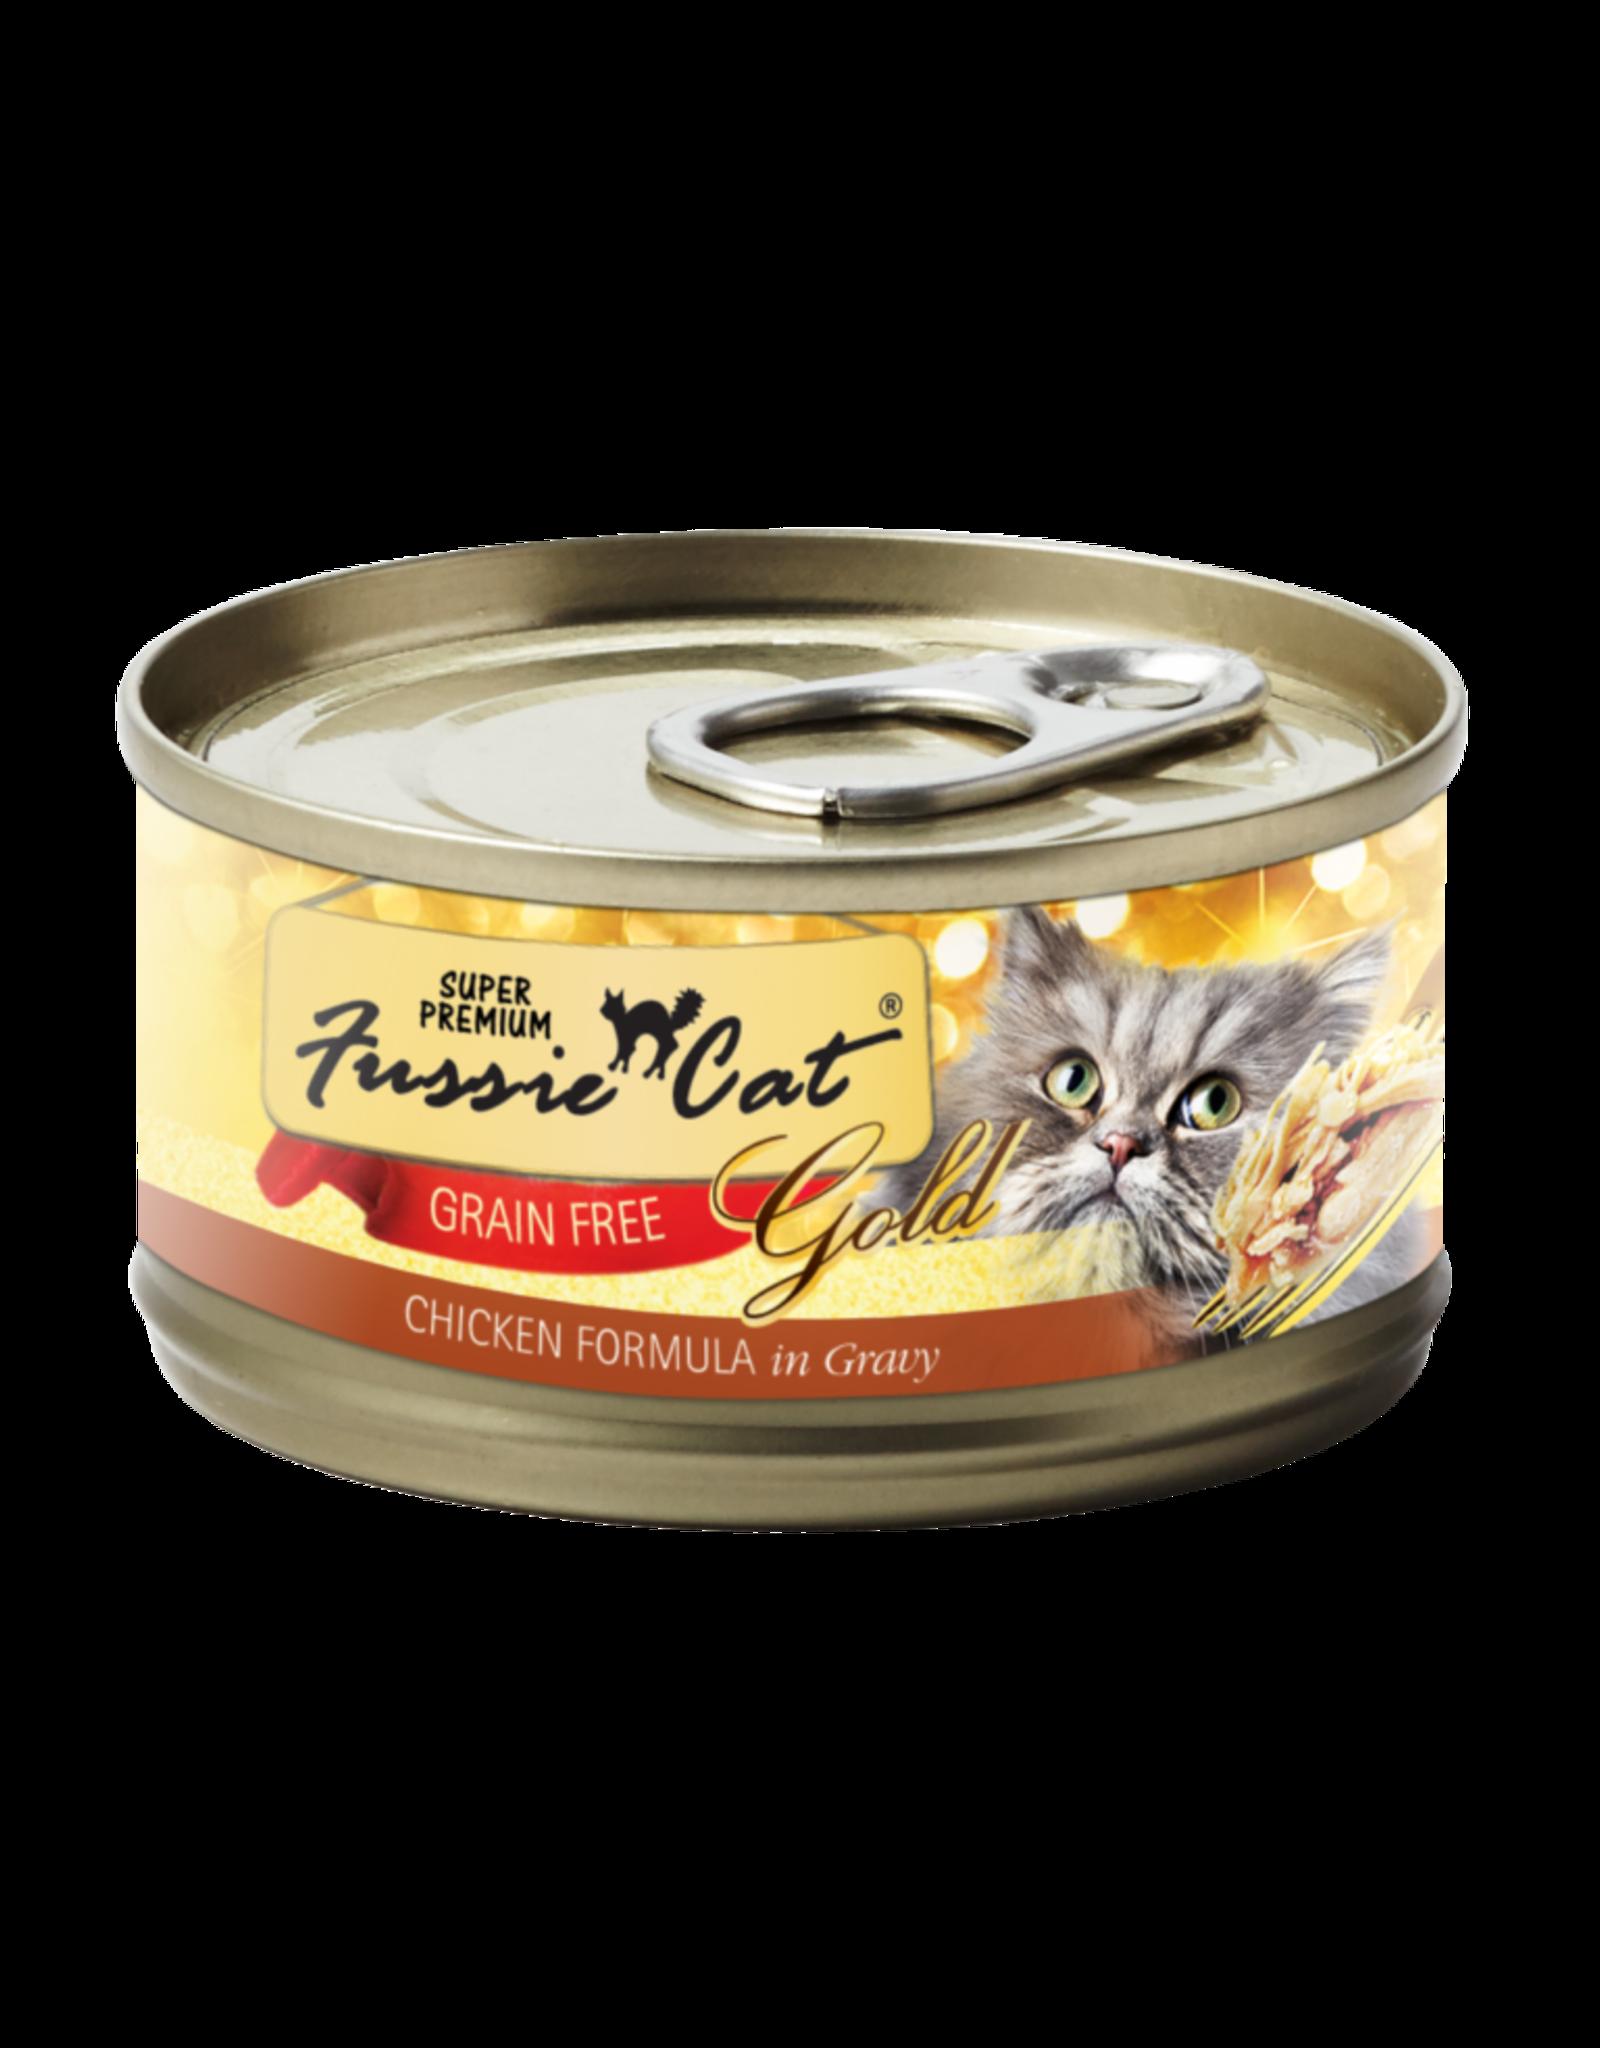 Fussie Cat FUSSIE CAT SUPER PREMIUM CHICKEN FORMULA IN GRAVY